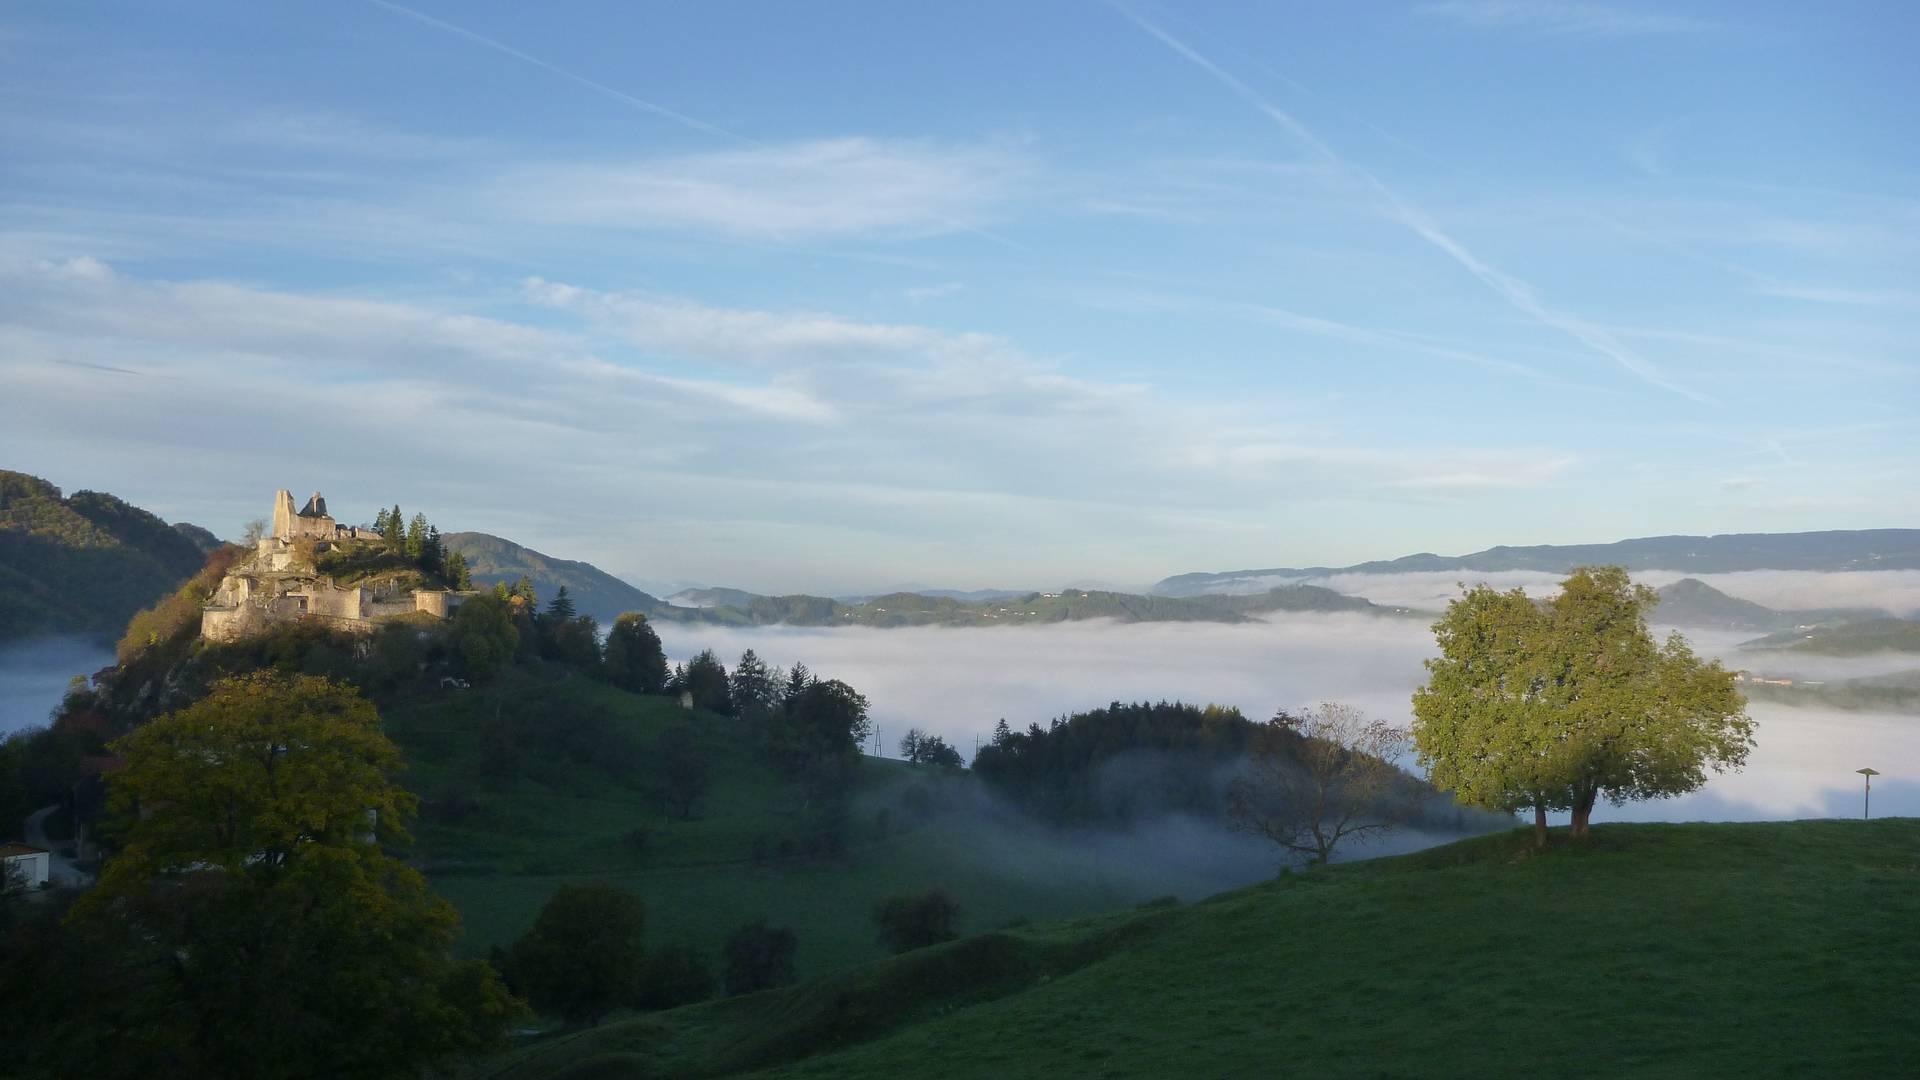 PWSA Etappe 13 Burgruine Rabenstein im Nebel copyright RML GmbH